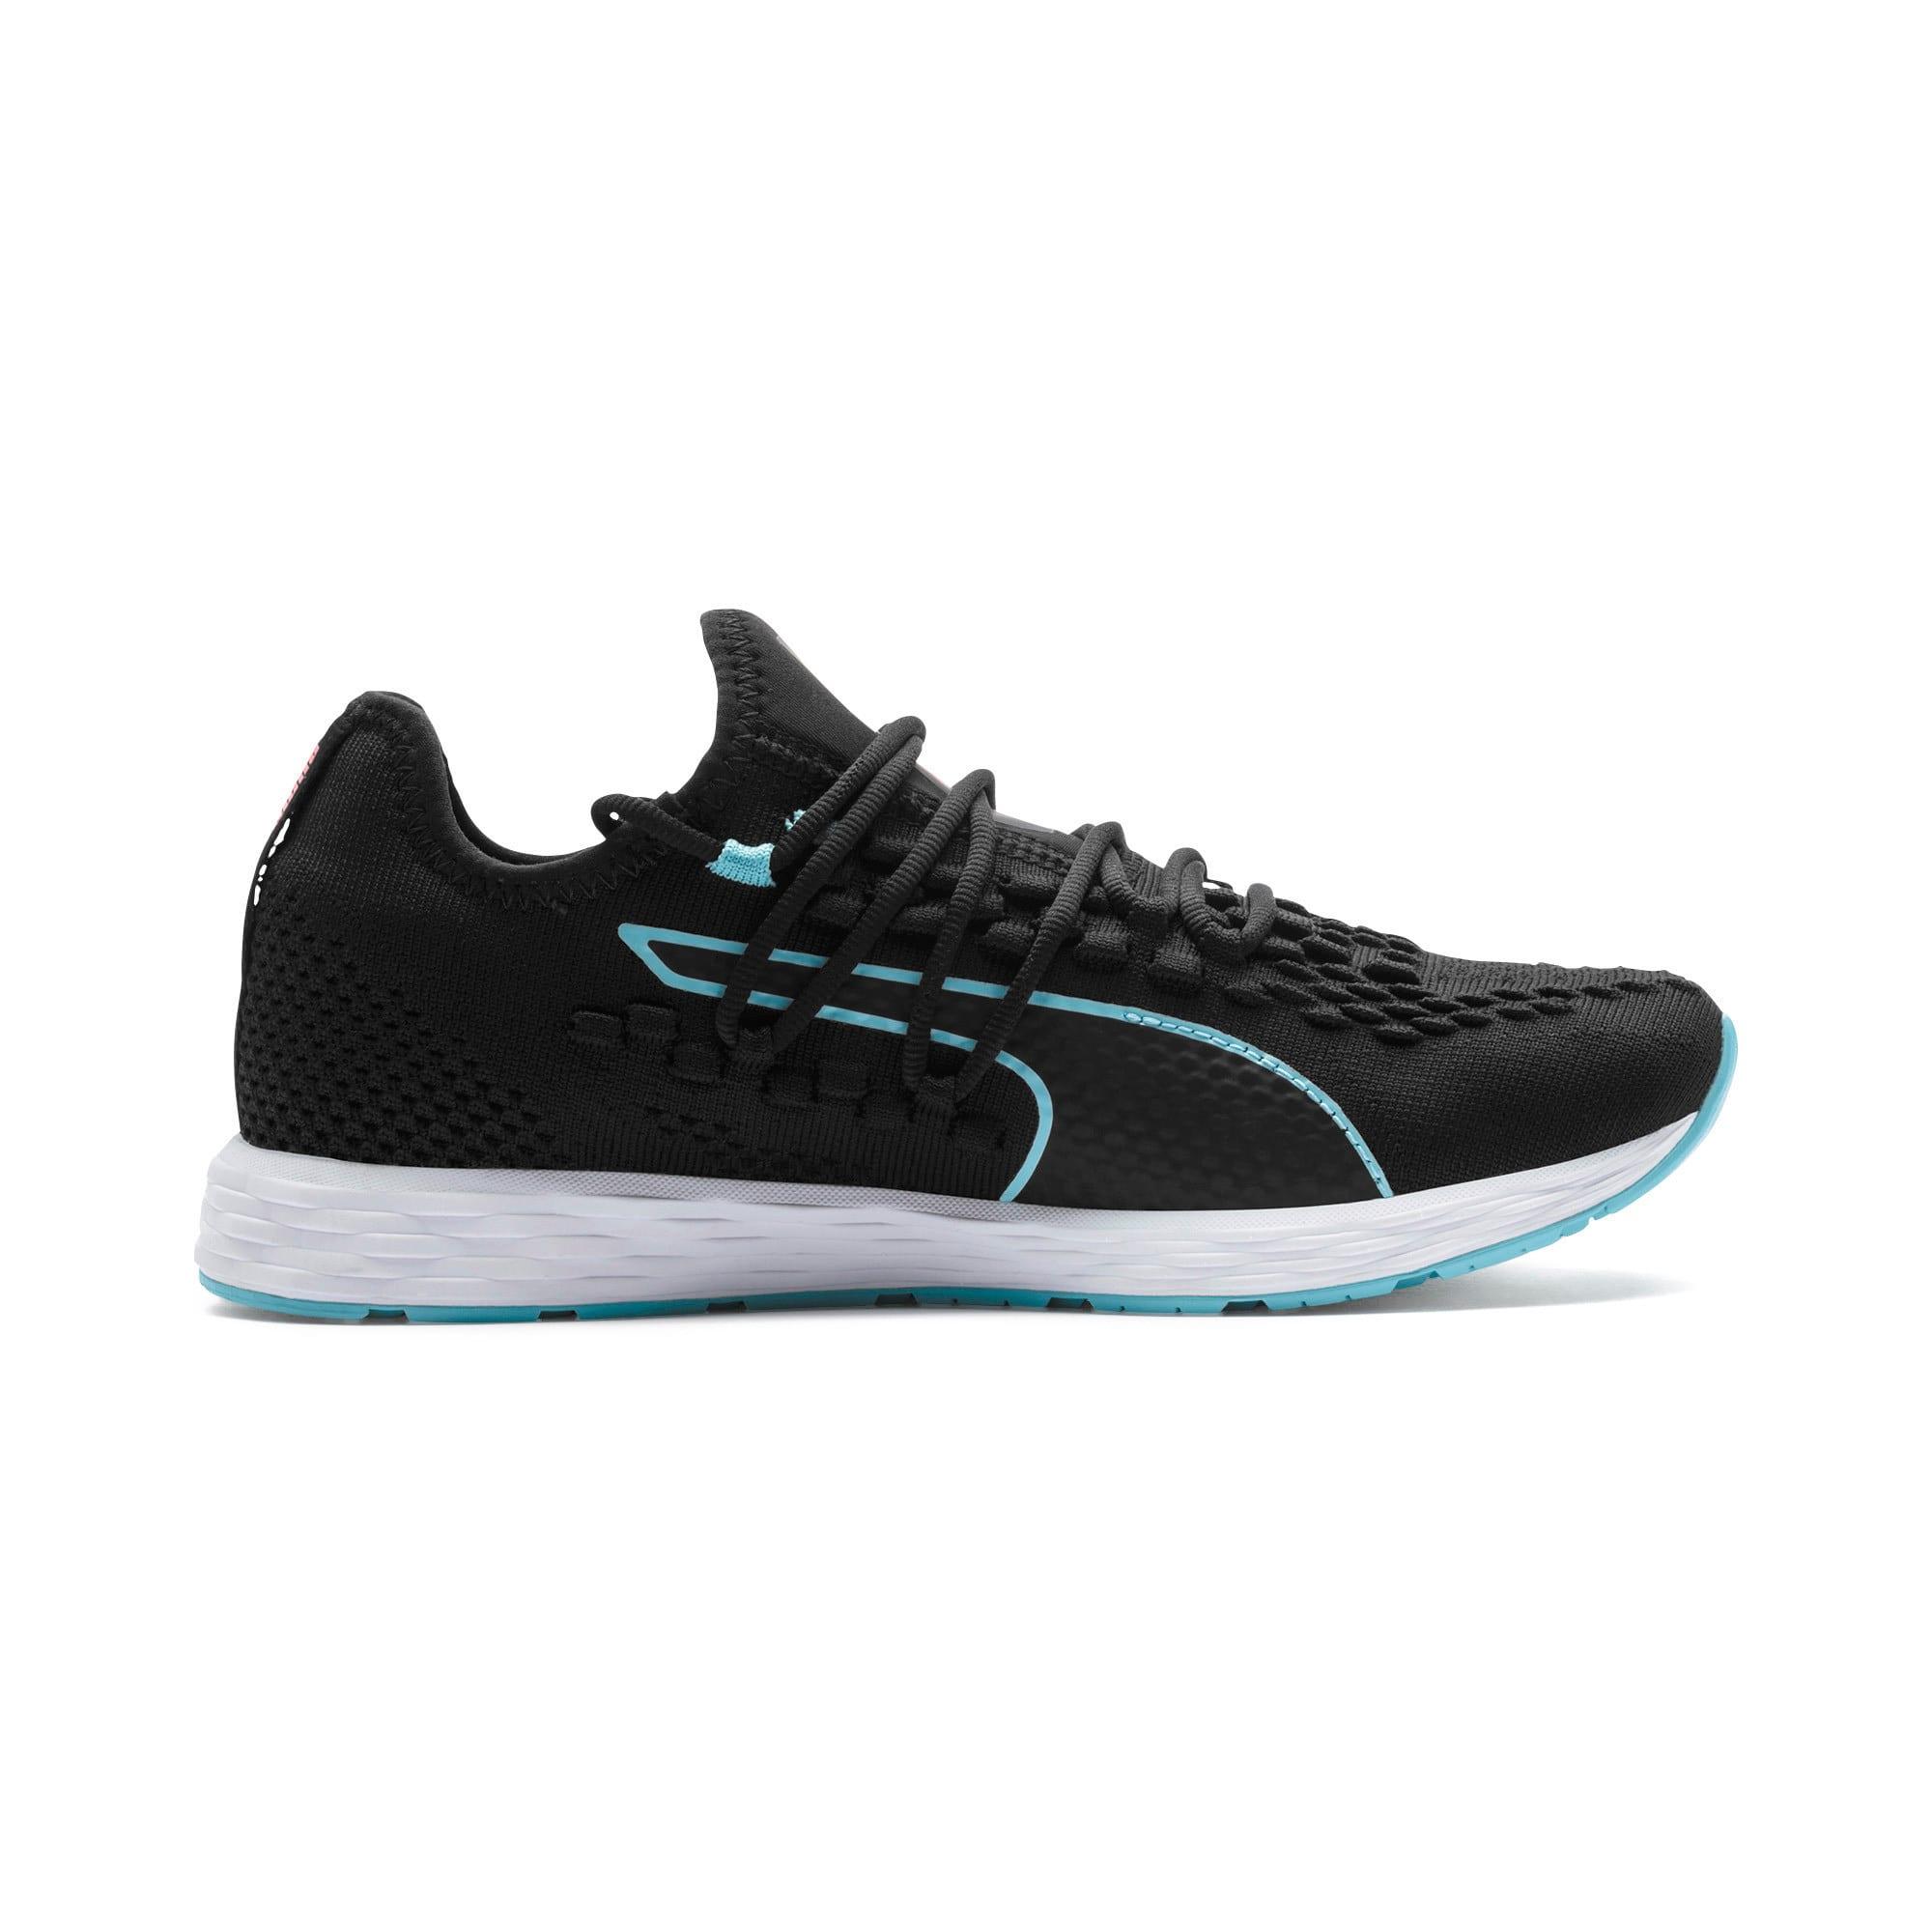 Thumbnail 6 of SPEED RACER Women's Running Shoes, Black-Milky Blue-Pink Alert, medium